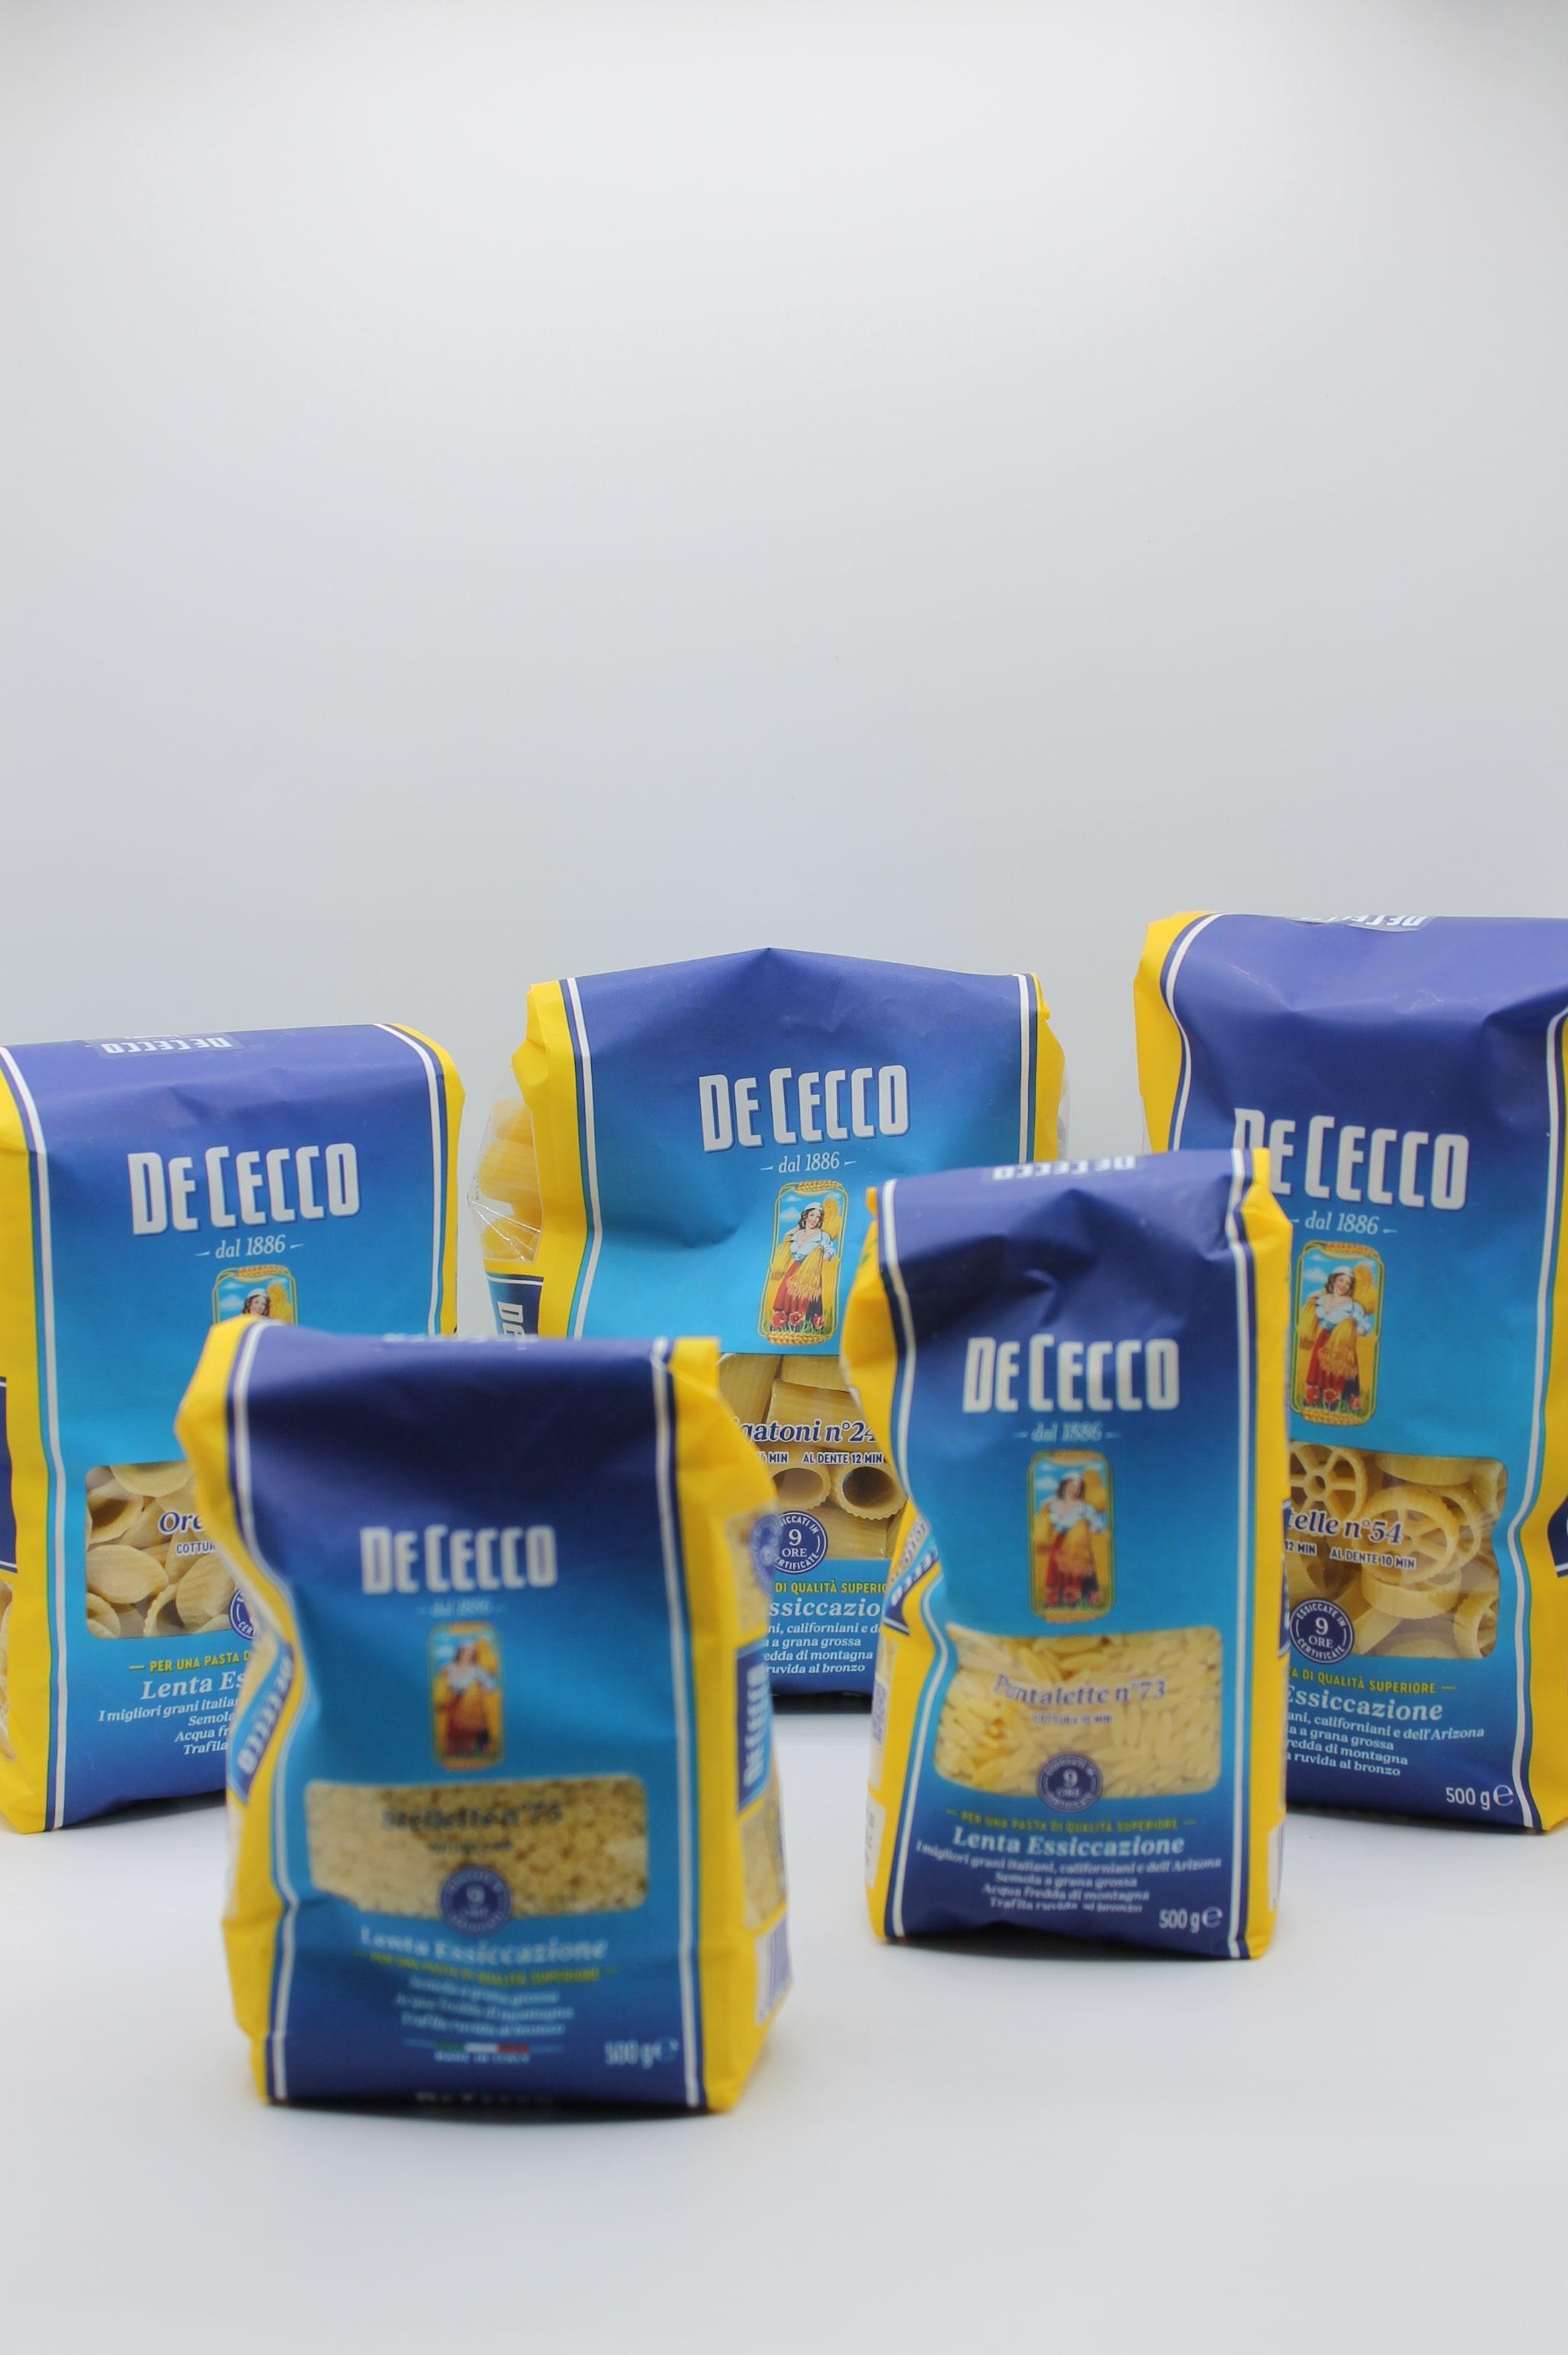 De Cecco pasta corta/pastina 500gr assortita.